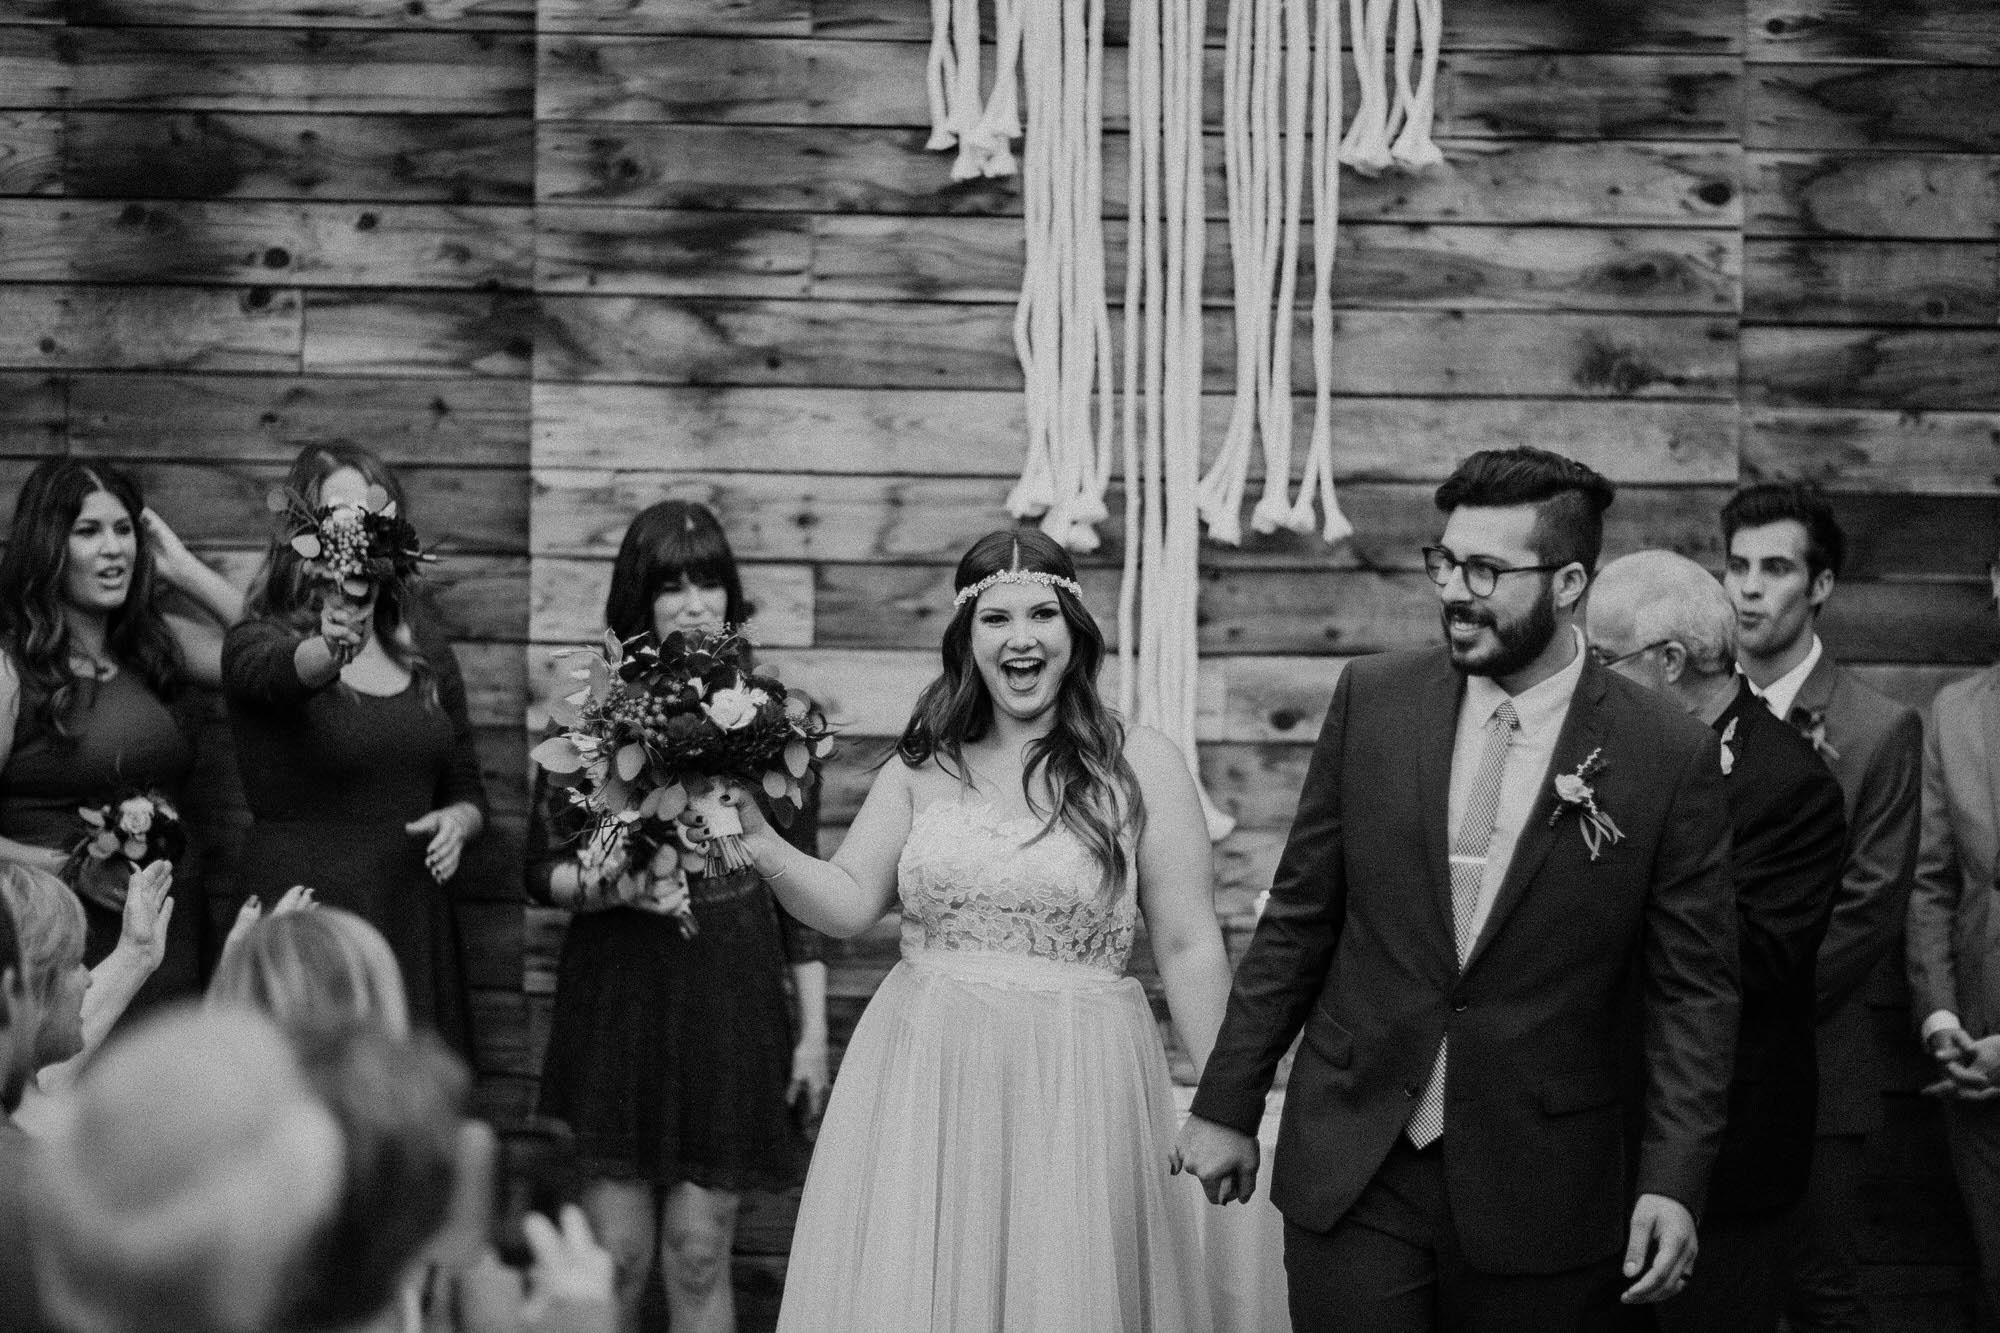 los-angeles-wedding-photographer-kristen-dylan-69.jpg